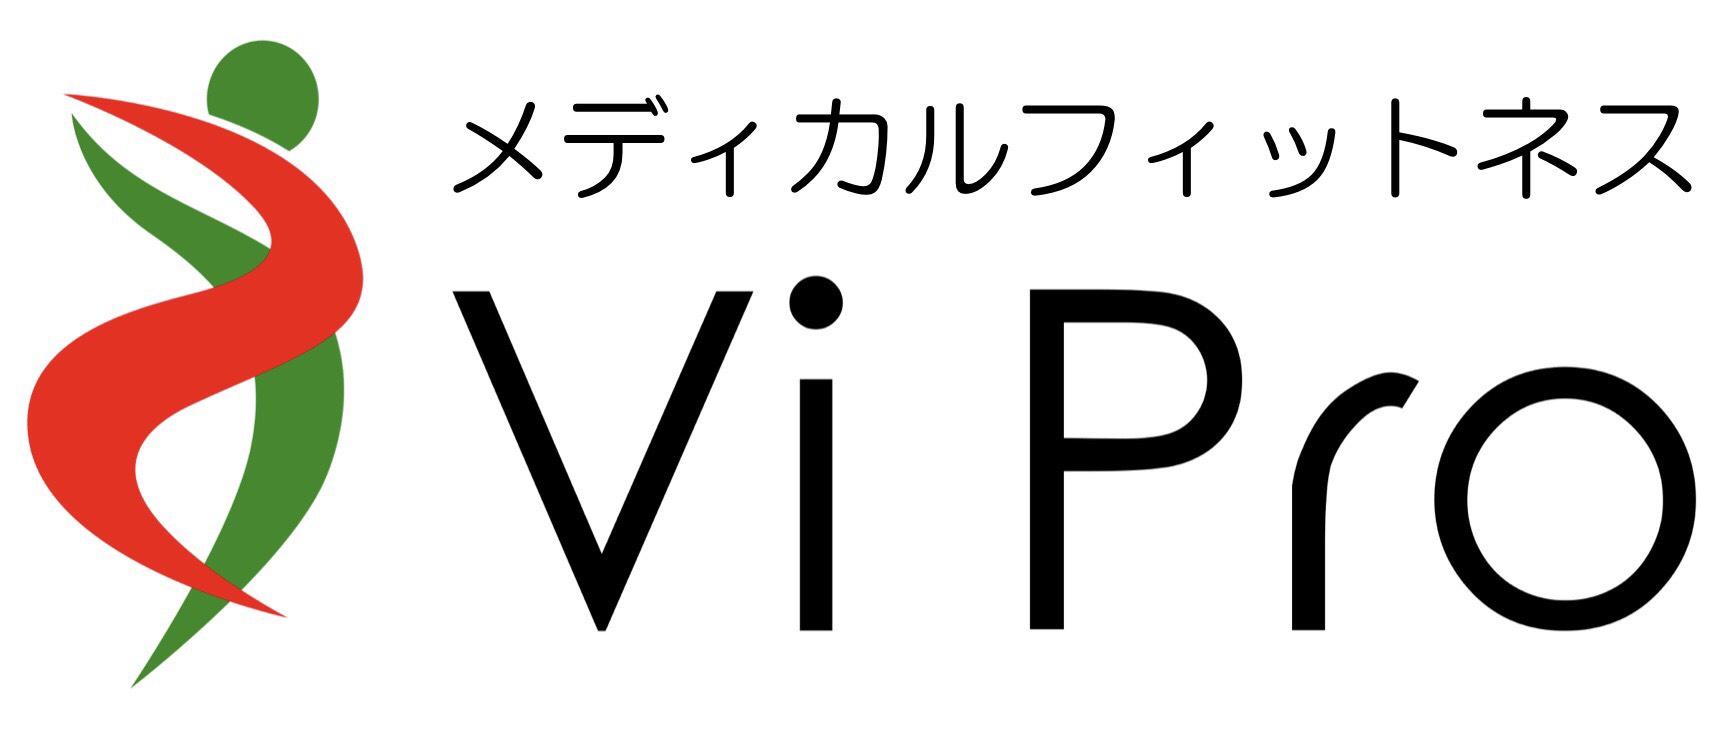 ViPro|代々木上原/代々木八幡から徒歩5分のメディカルフィットネス-ヴィプロ